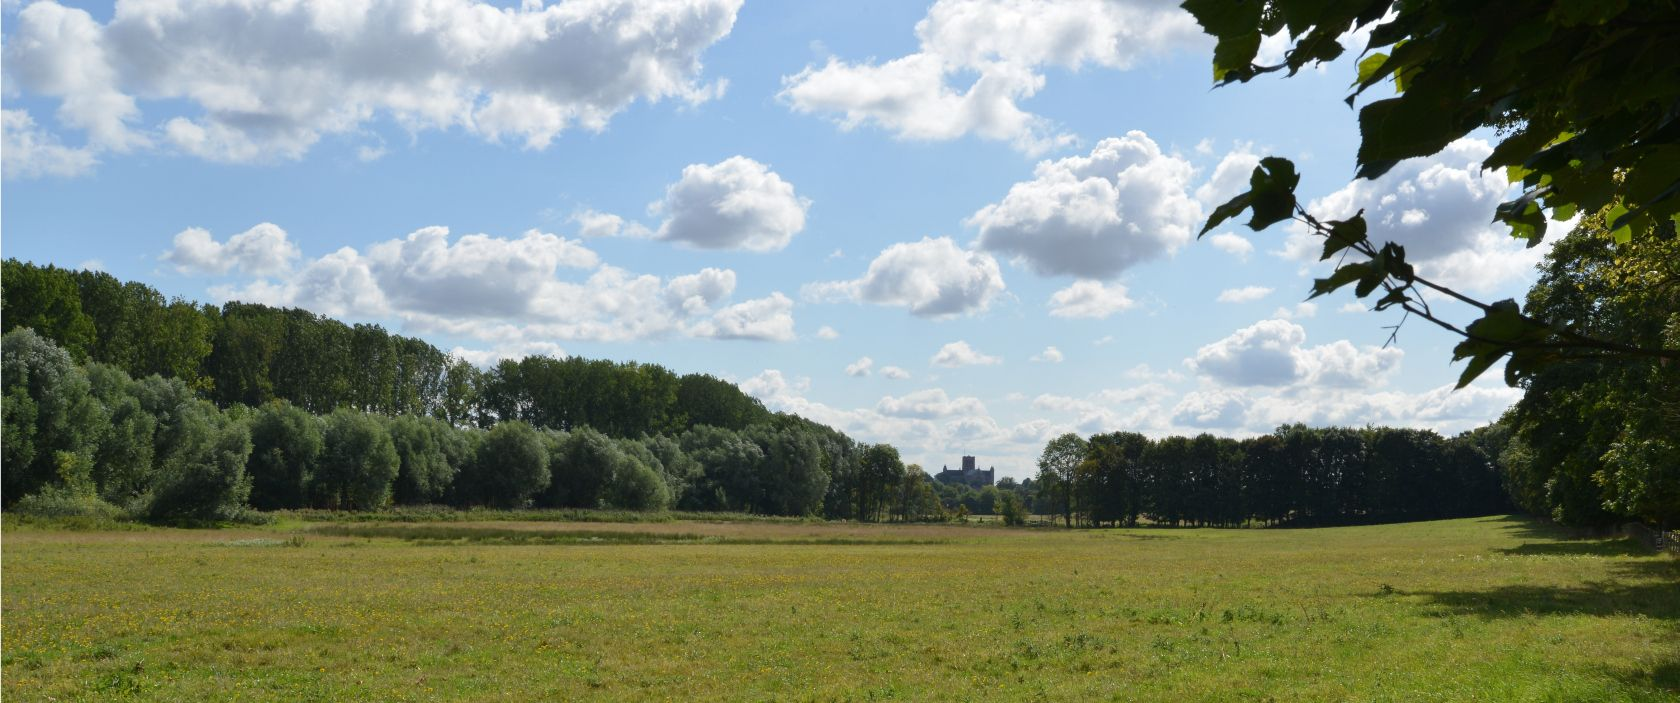 Prae Meadow, part of Gorhambury Estate, St Albans